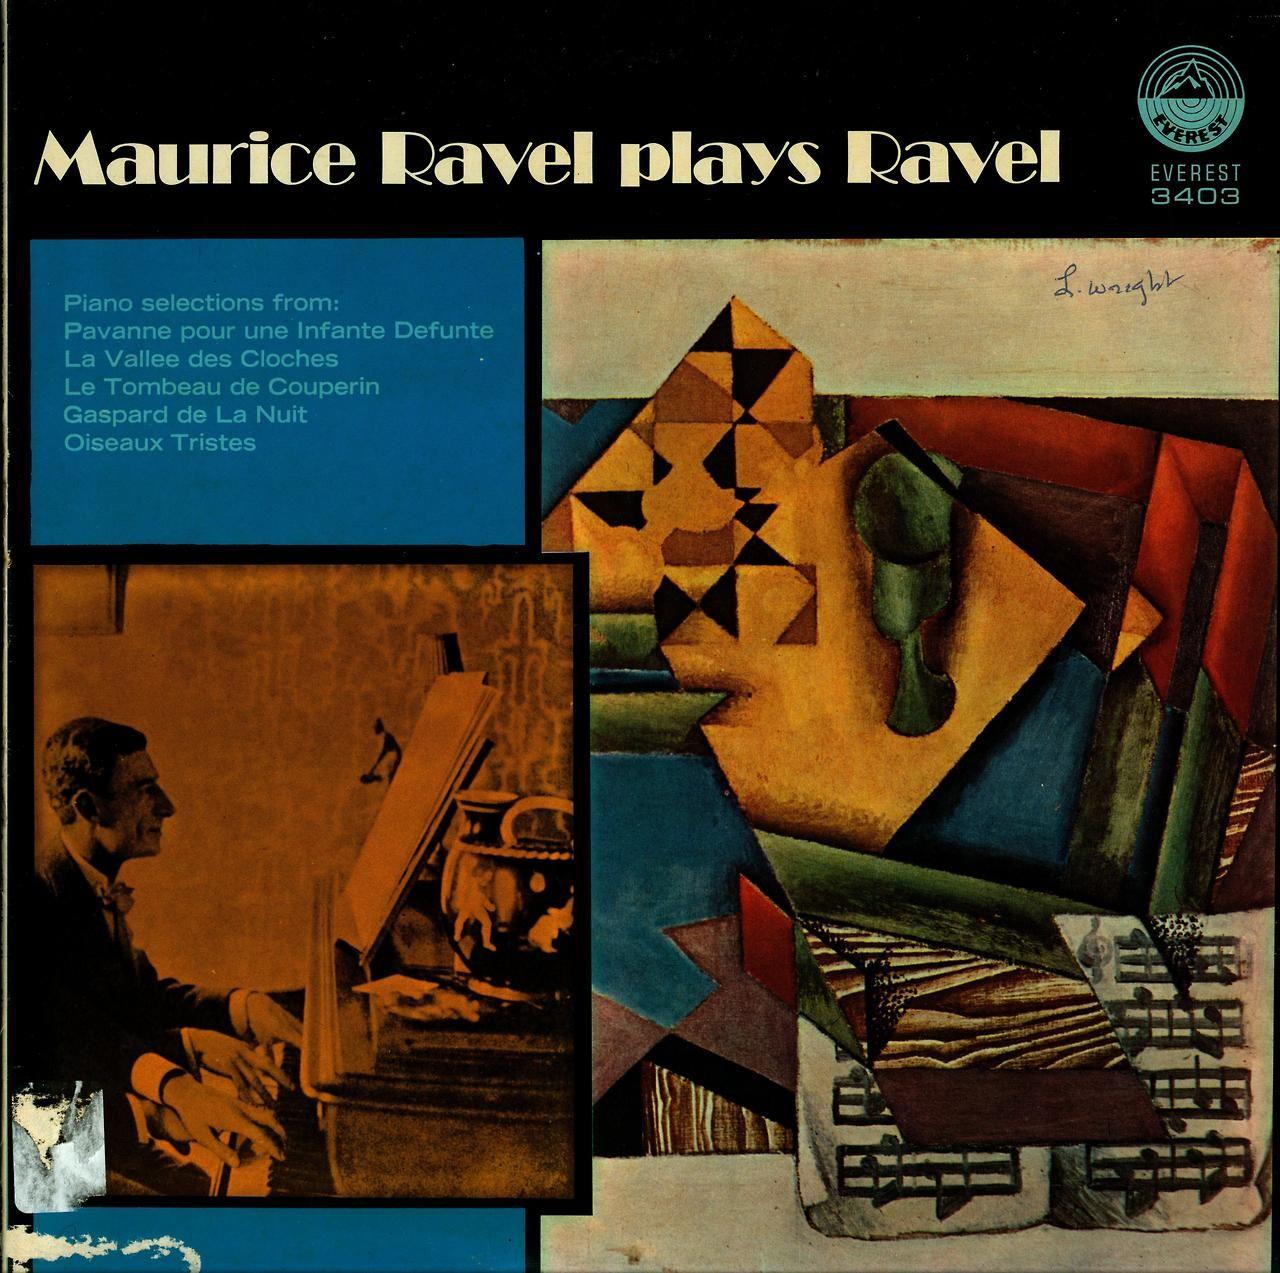 Maurice Ravel plays Ravel  Everest 3403 (1976)